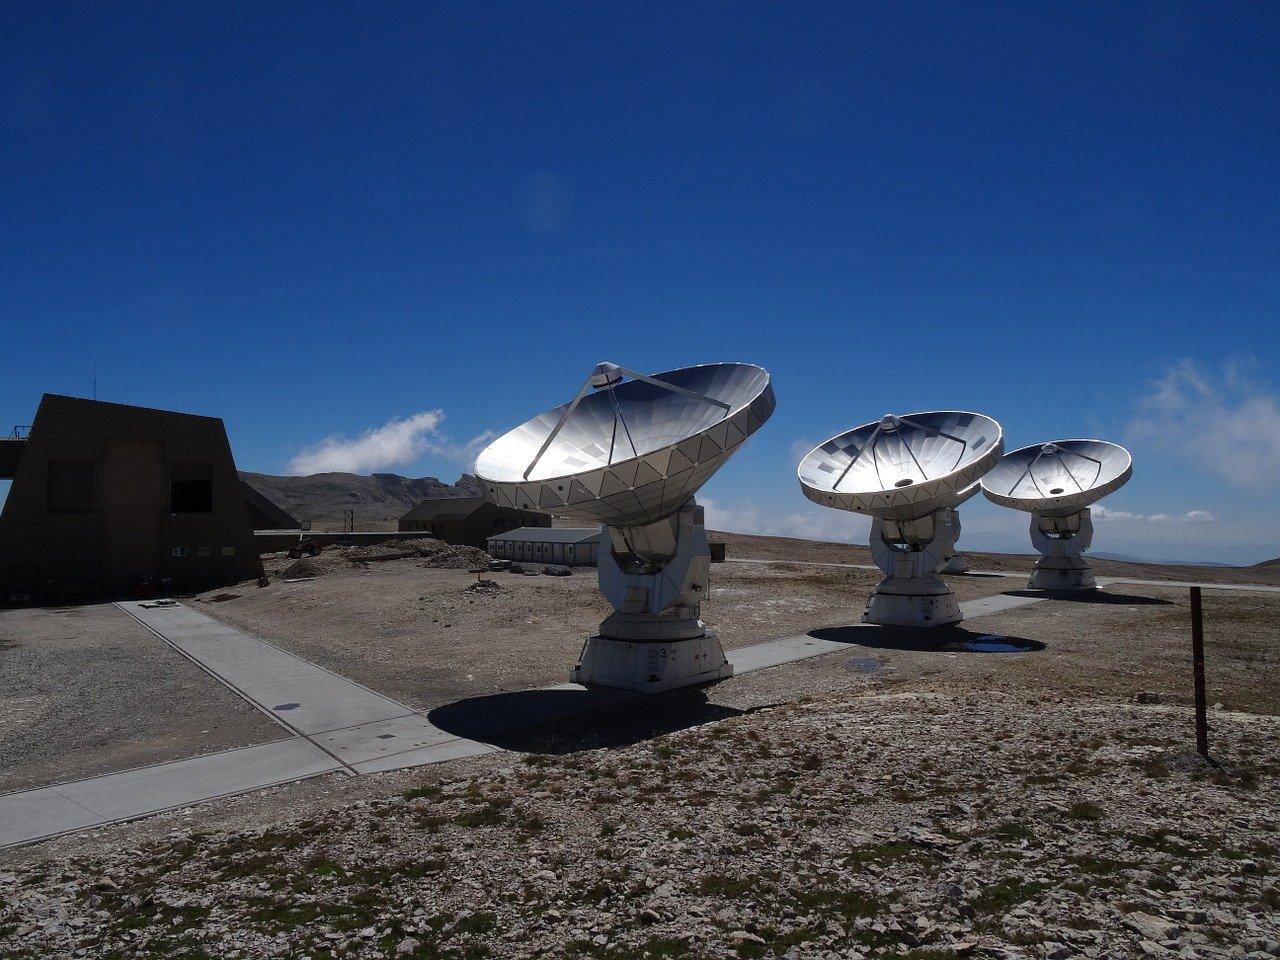 pic de bure radiotelescope